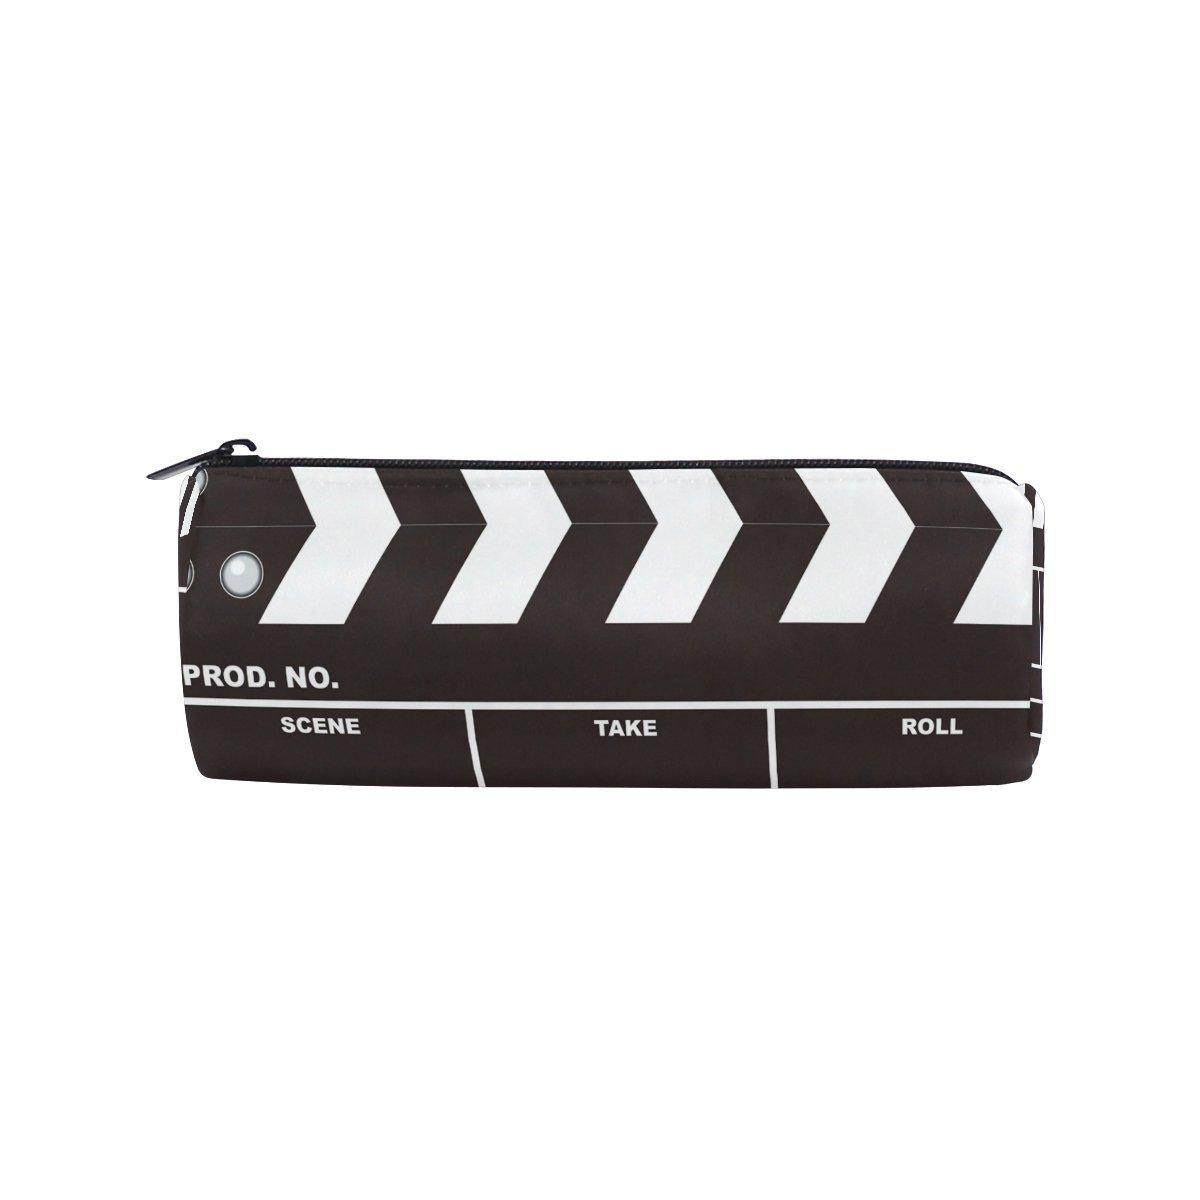 KUWT Pencil Bag Movie Clapboard Music Pattern, Pencil Case Pen Zipper Bag Pouch Holder Makeup Brush Bag for School Work Office